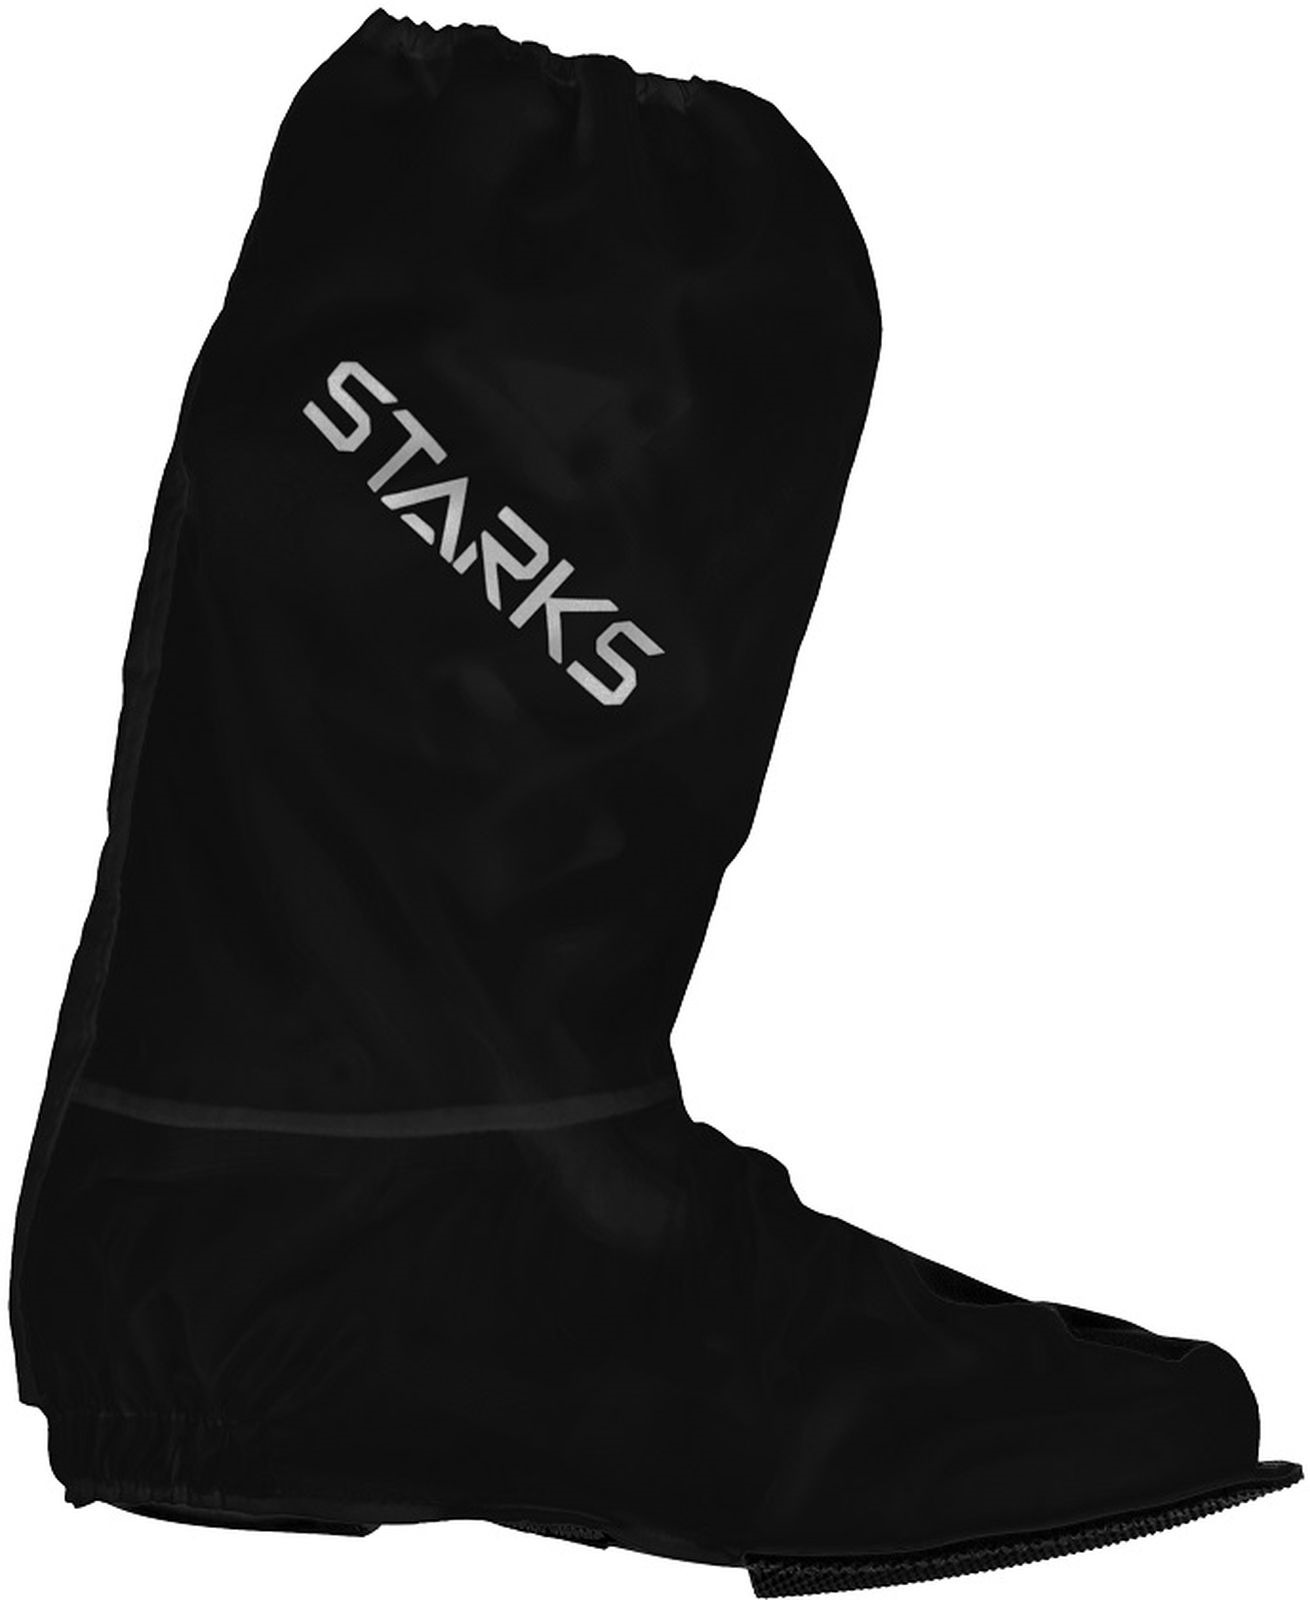 Мотодождевик Starks Rain Boots, LC0054, черный, размер L Starks